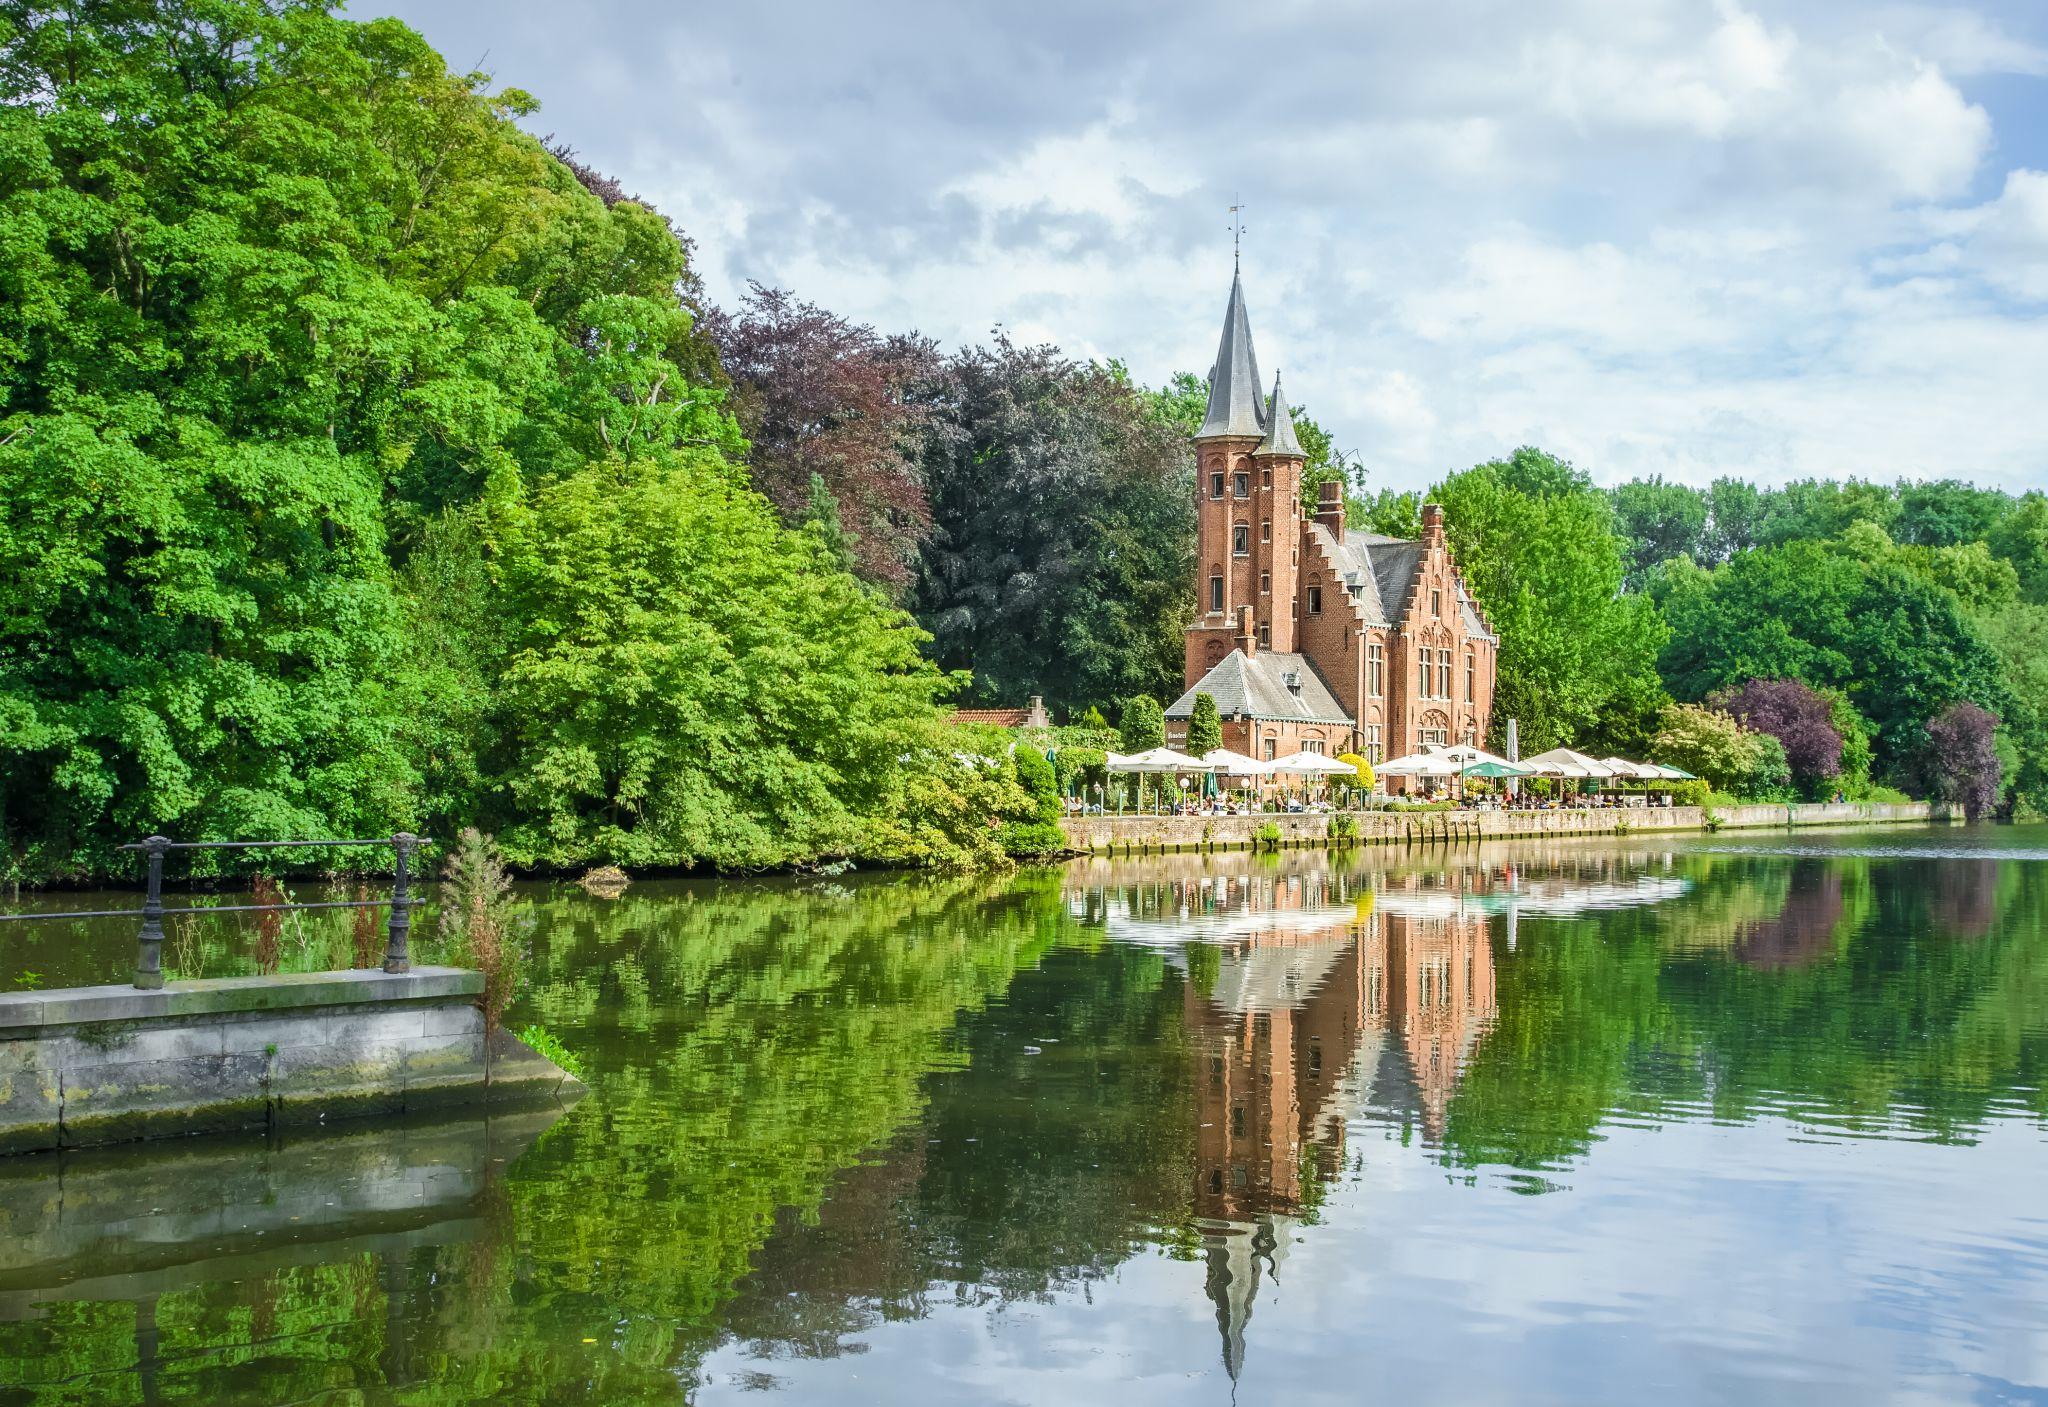 Kasteel Minnewater, Belgium